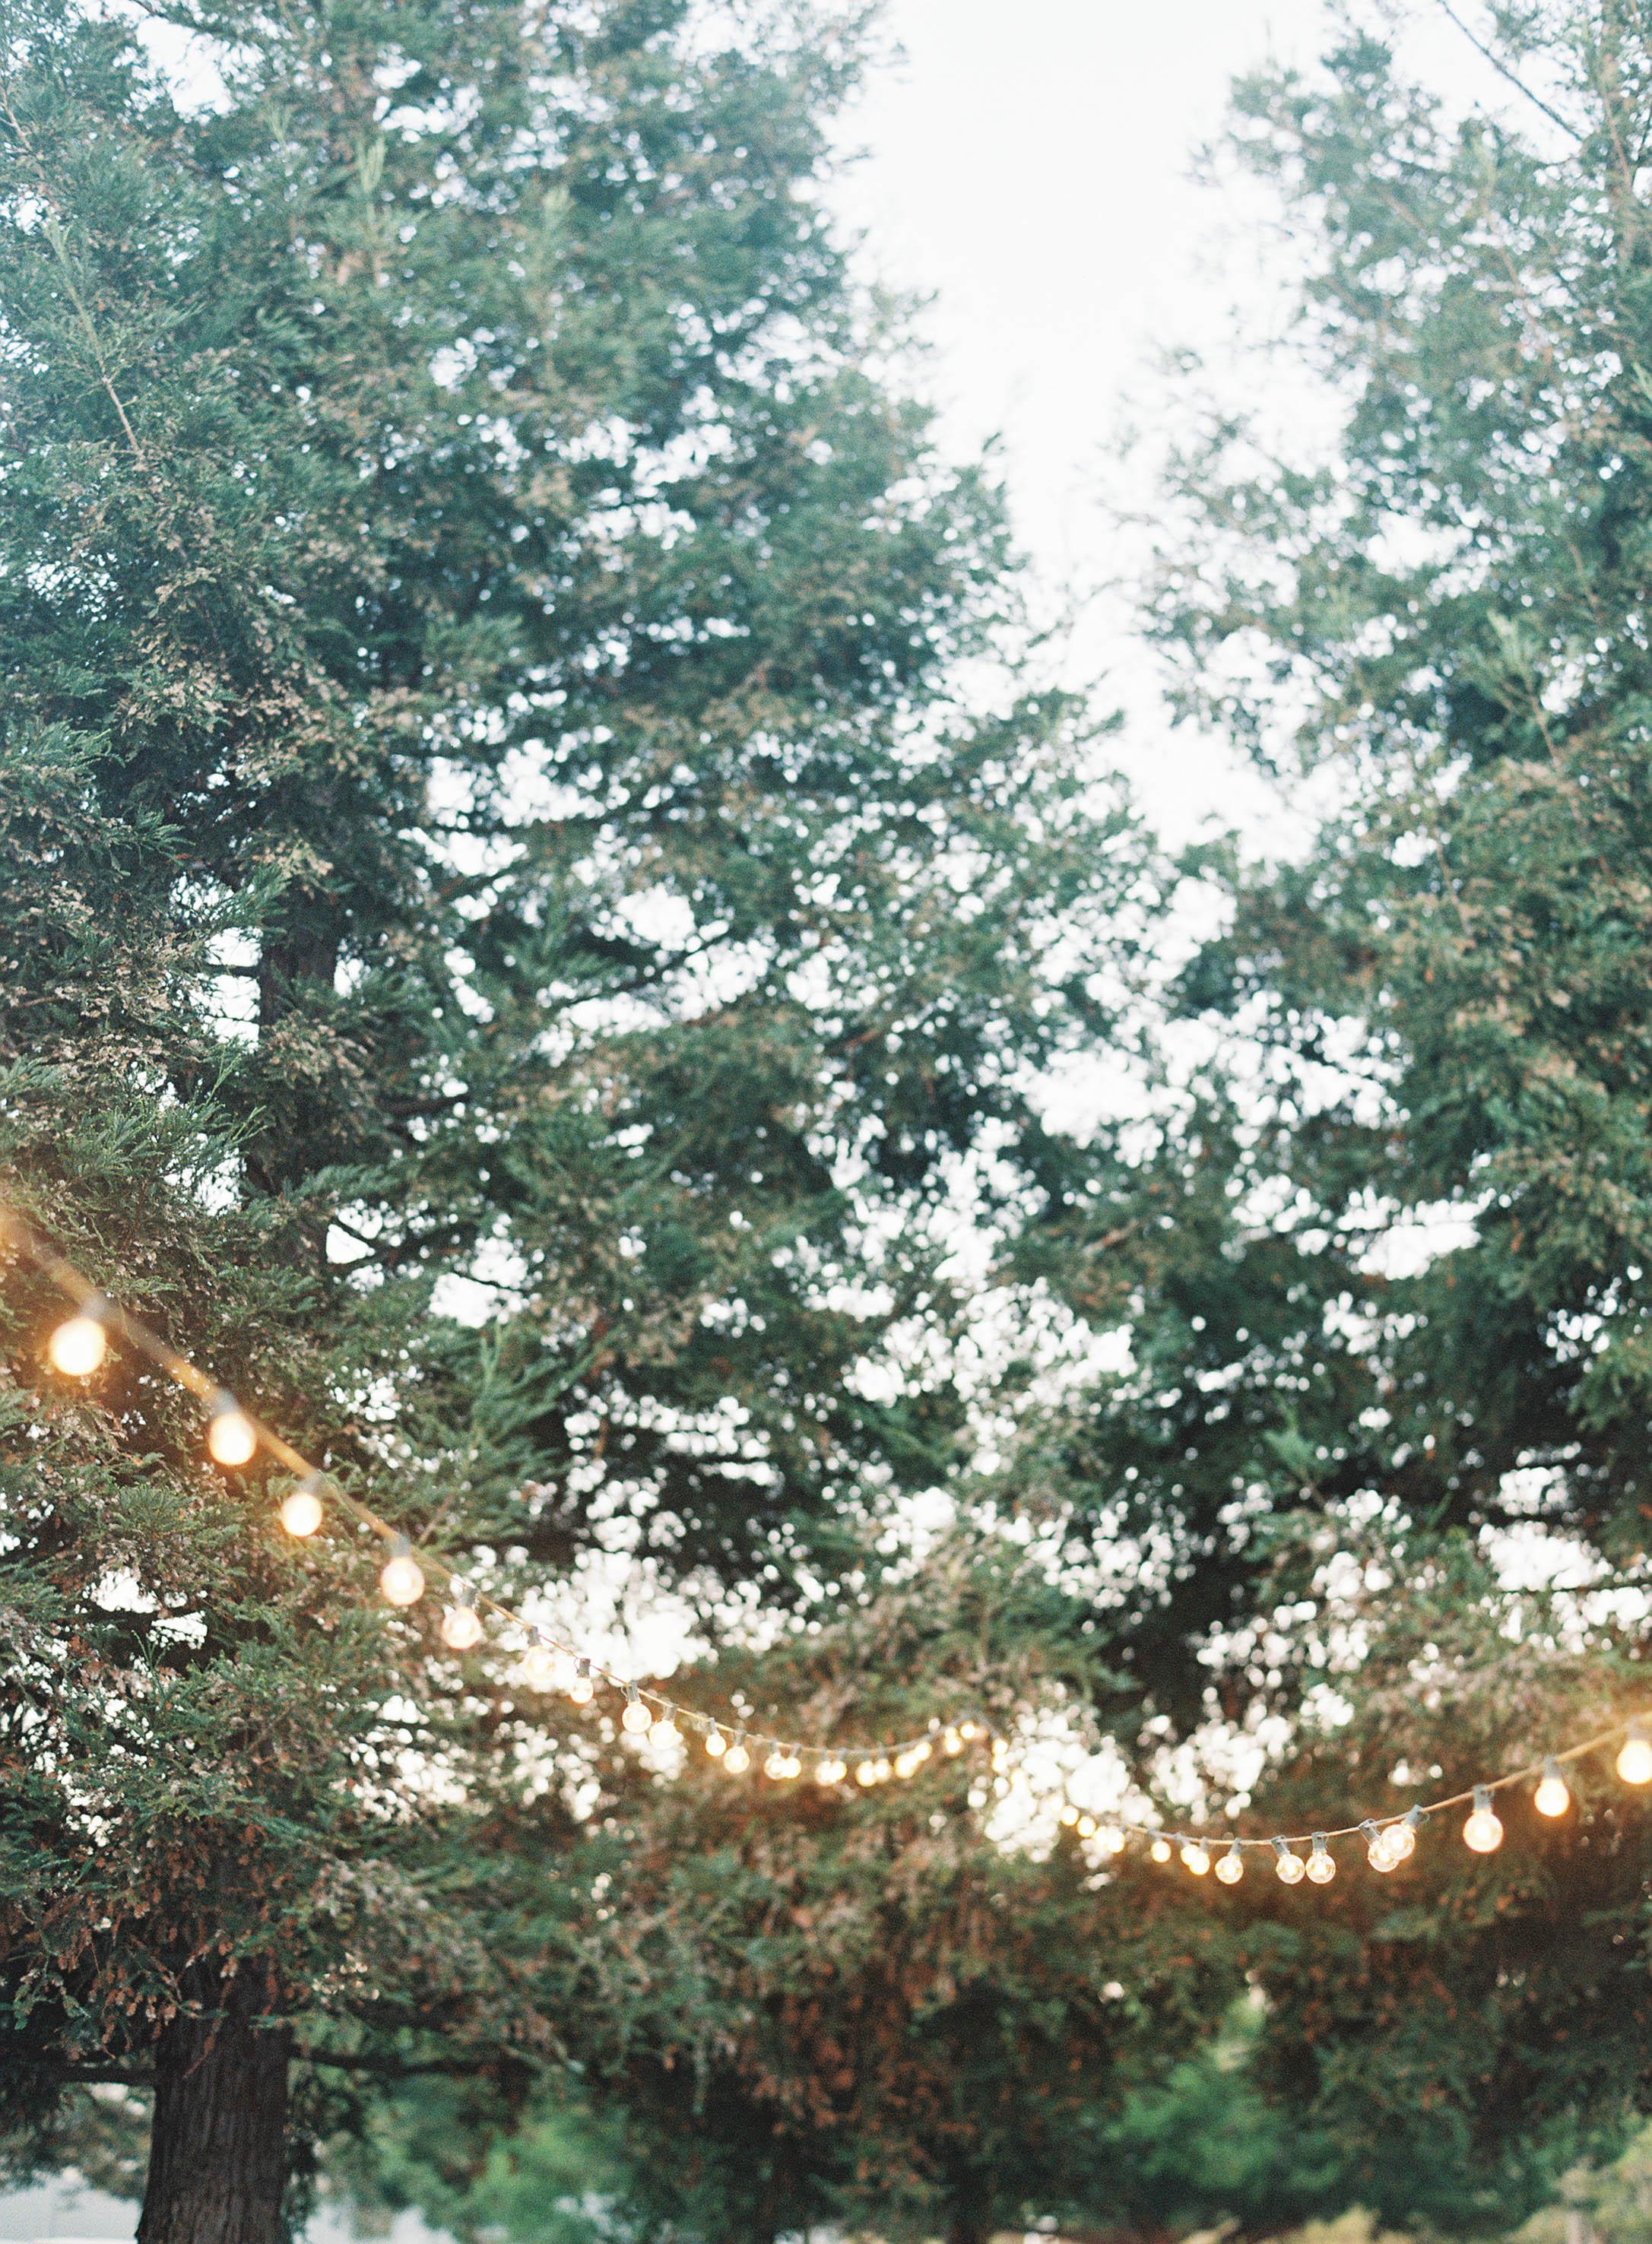 Meghan Mehan Photography - Fine Art Film Photography - Nashville | San Francisco | Napa | Sonoma | Big Sur | Carmel | Tennessee 146.jpg